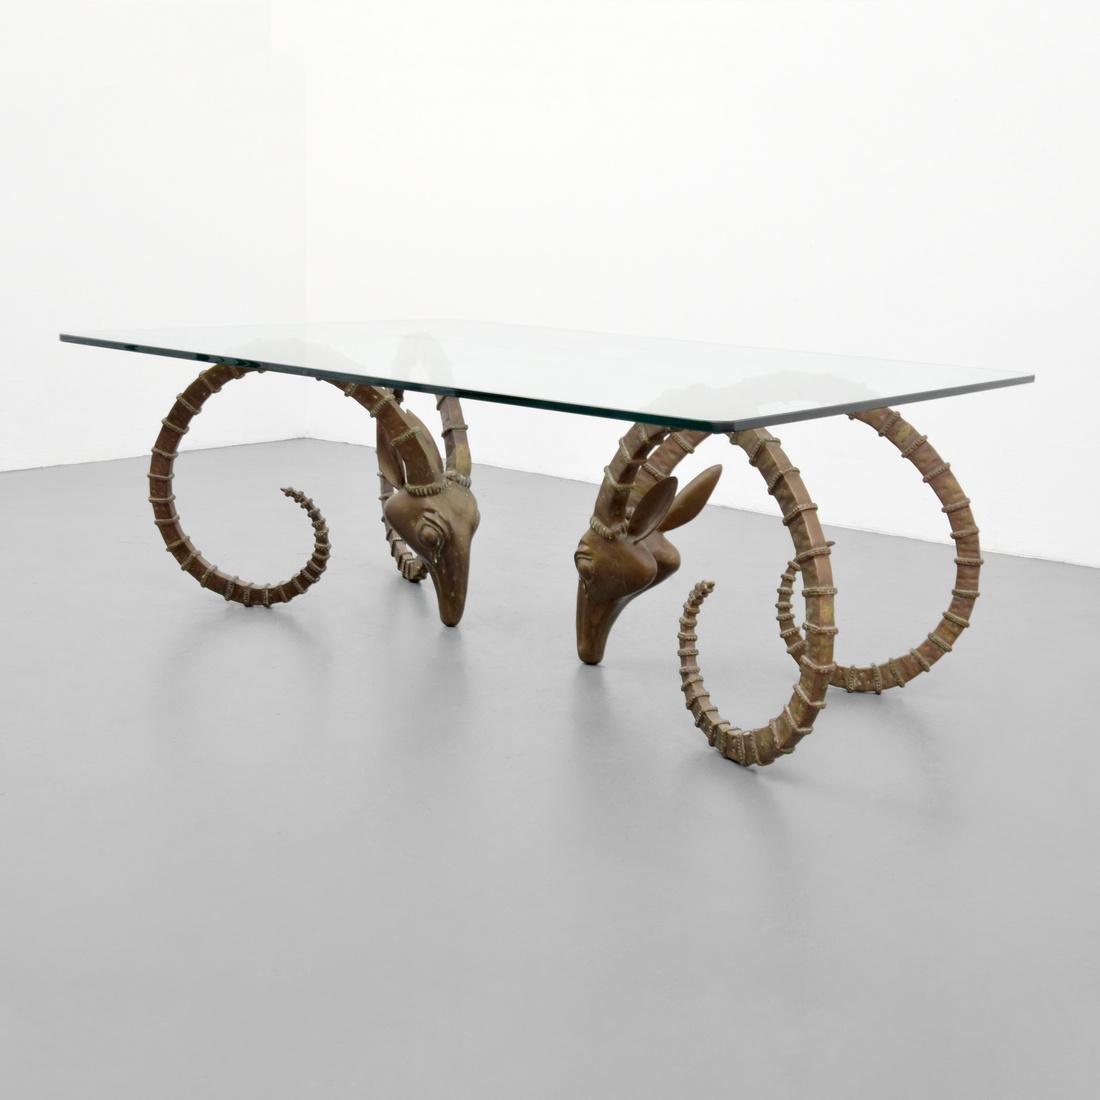 Ibex Coffee Table, Manner of Alain Chervet - 8